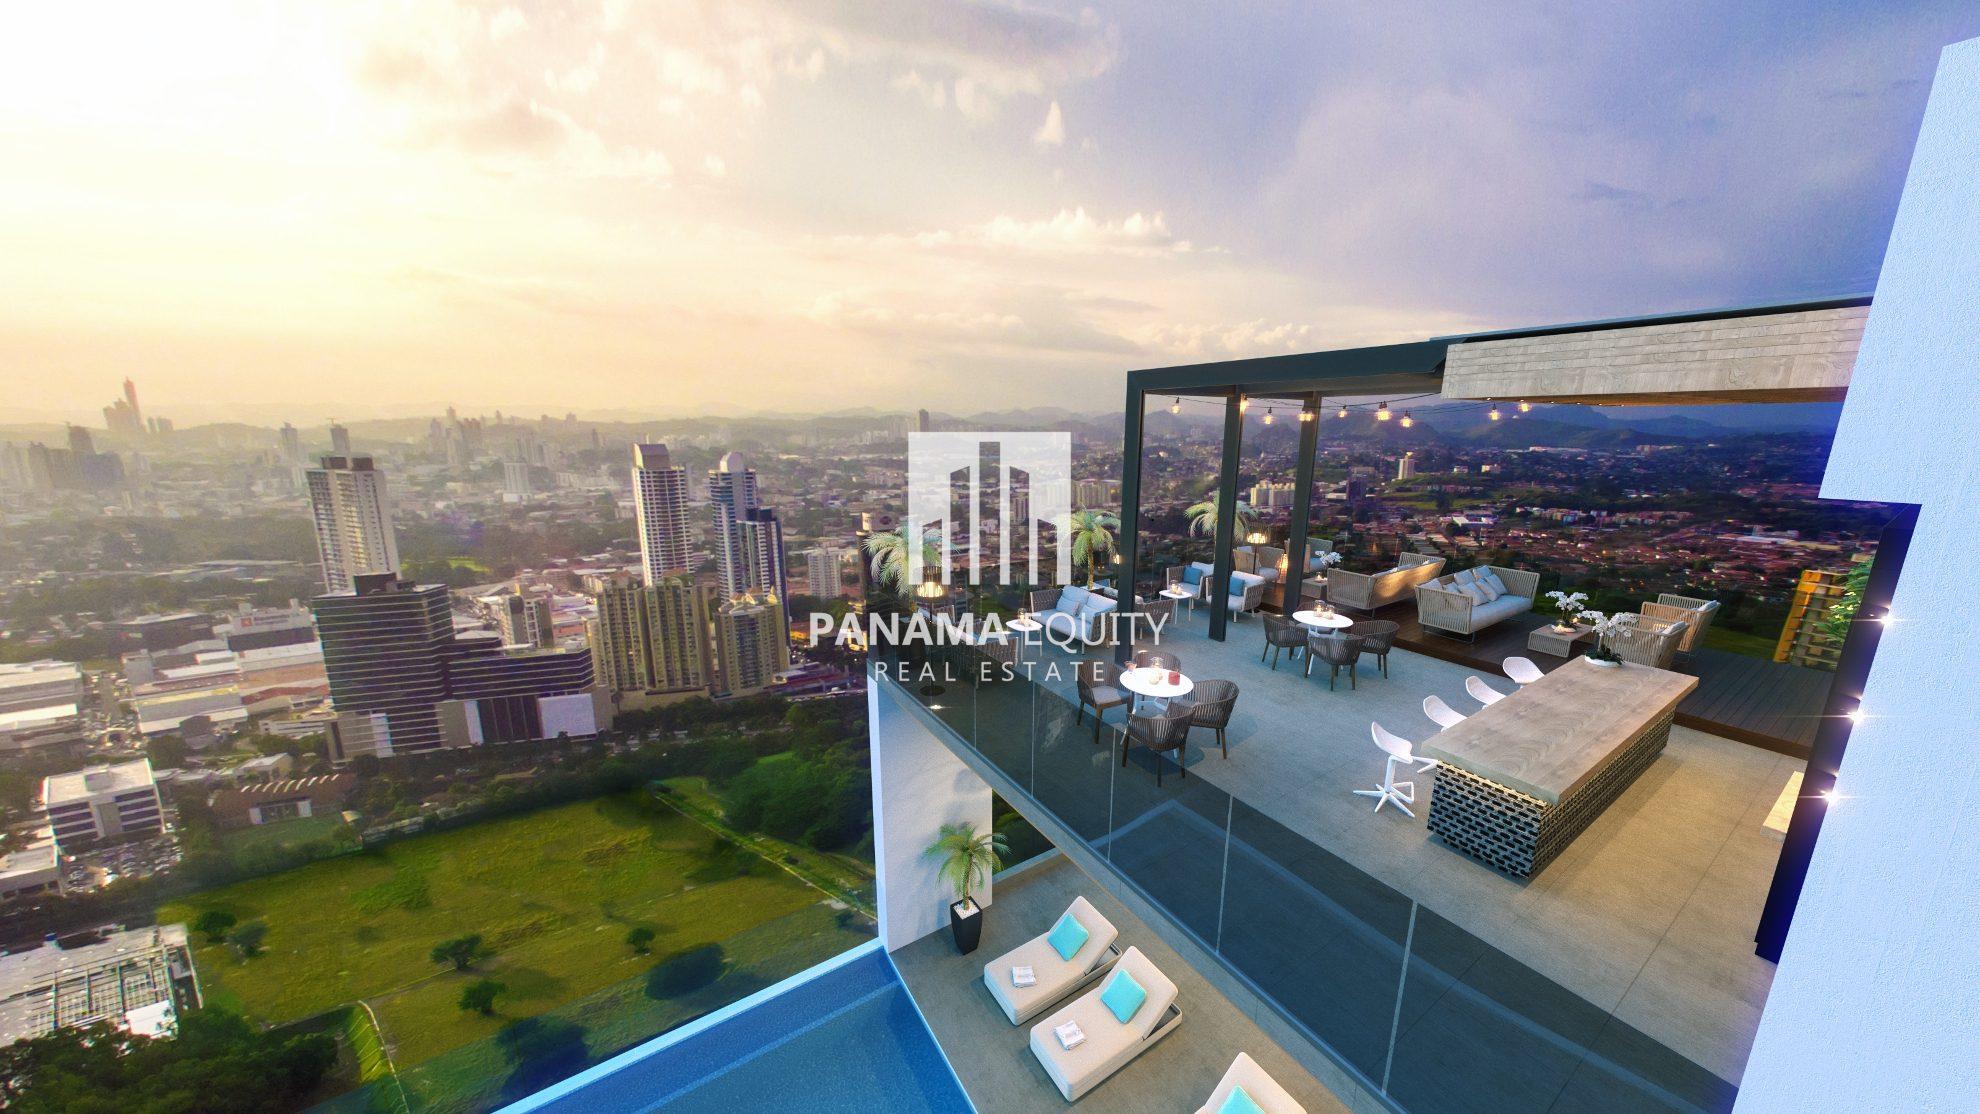 Un Concepto Totalmente Nuevo para Panamá